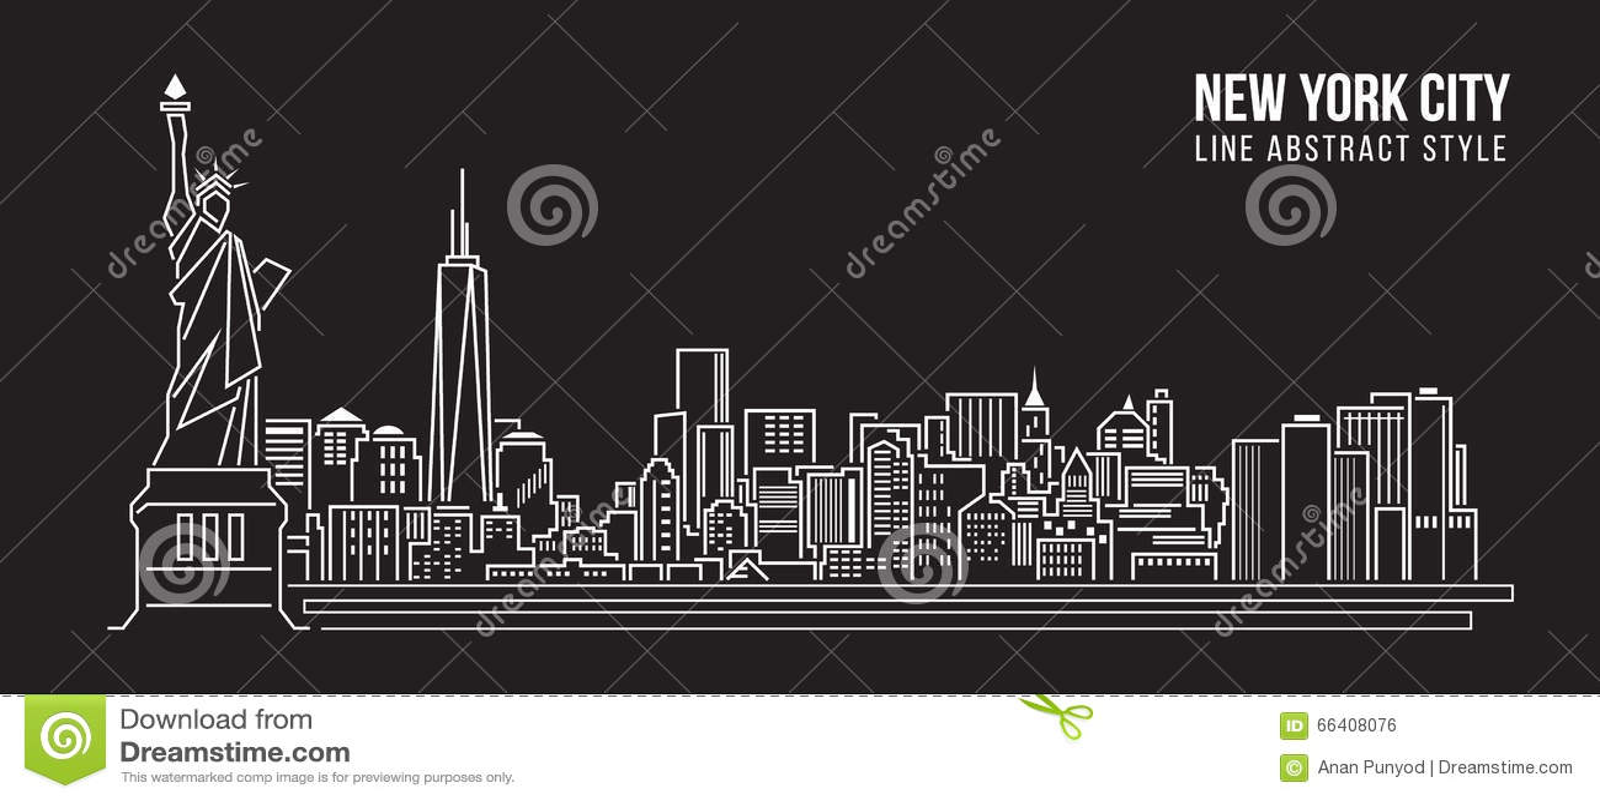 Line Art New York City : Cityscape building line art vector illustration design